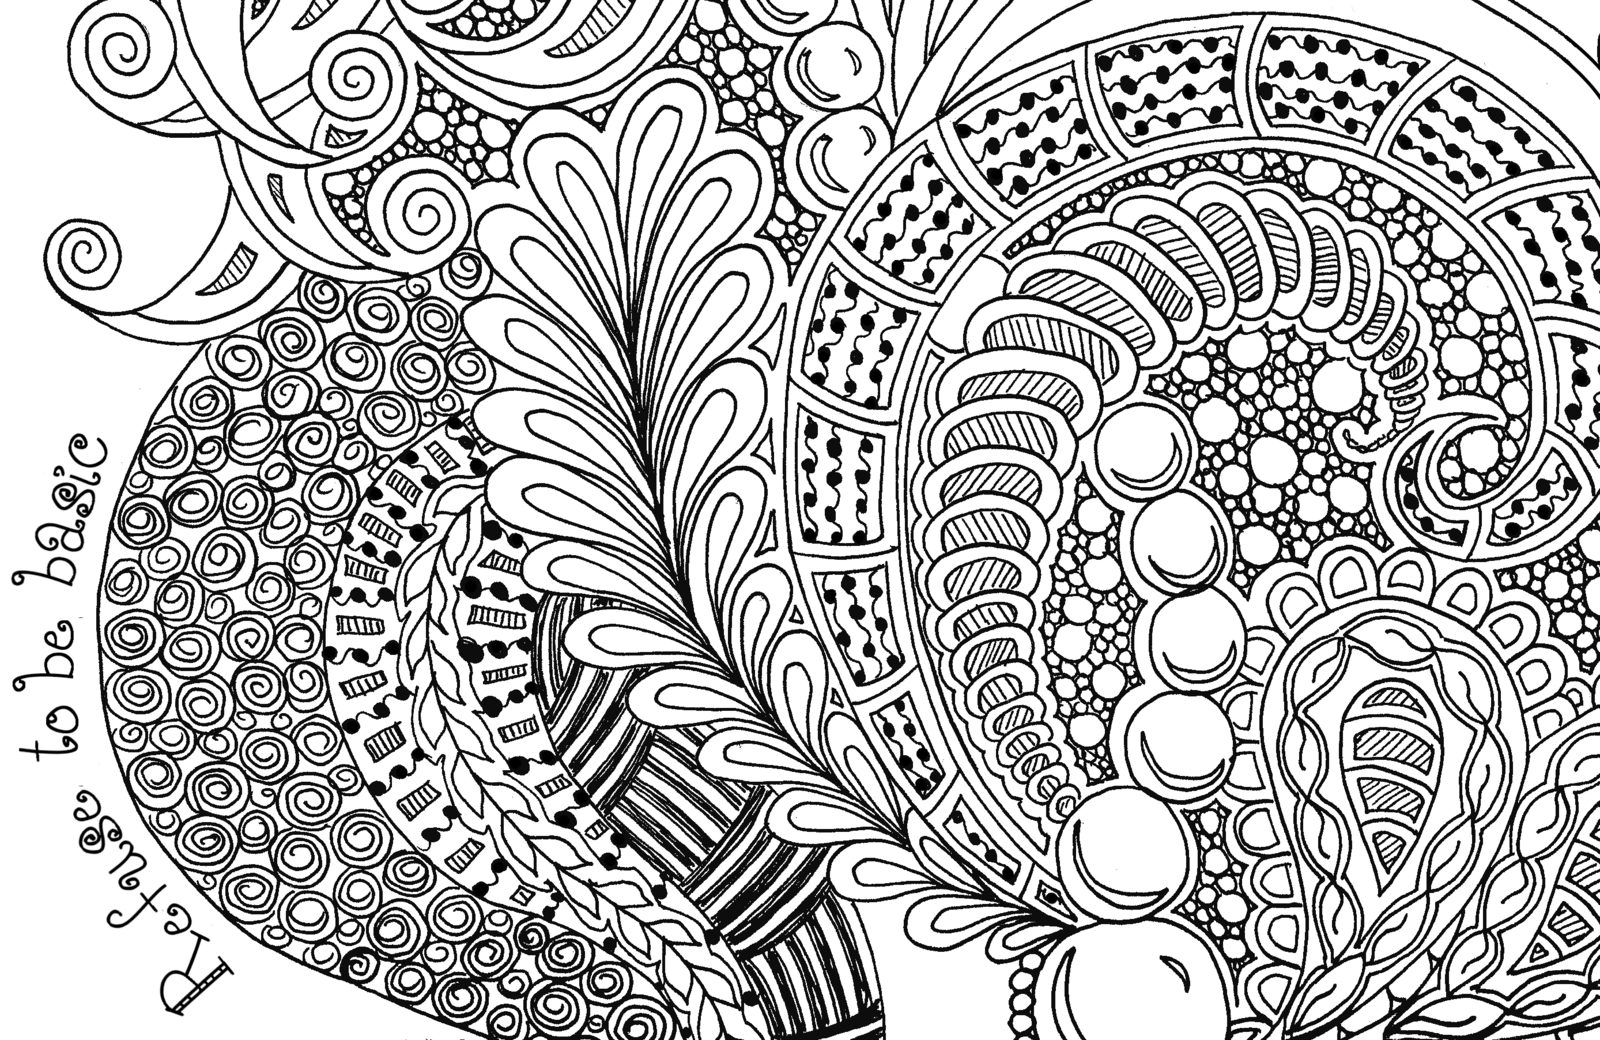 Basic Zentangle | Refuse to be Basic Zentangle Doodle Drawing by *KatAhrens on ...